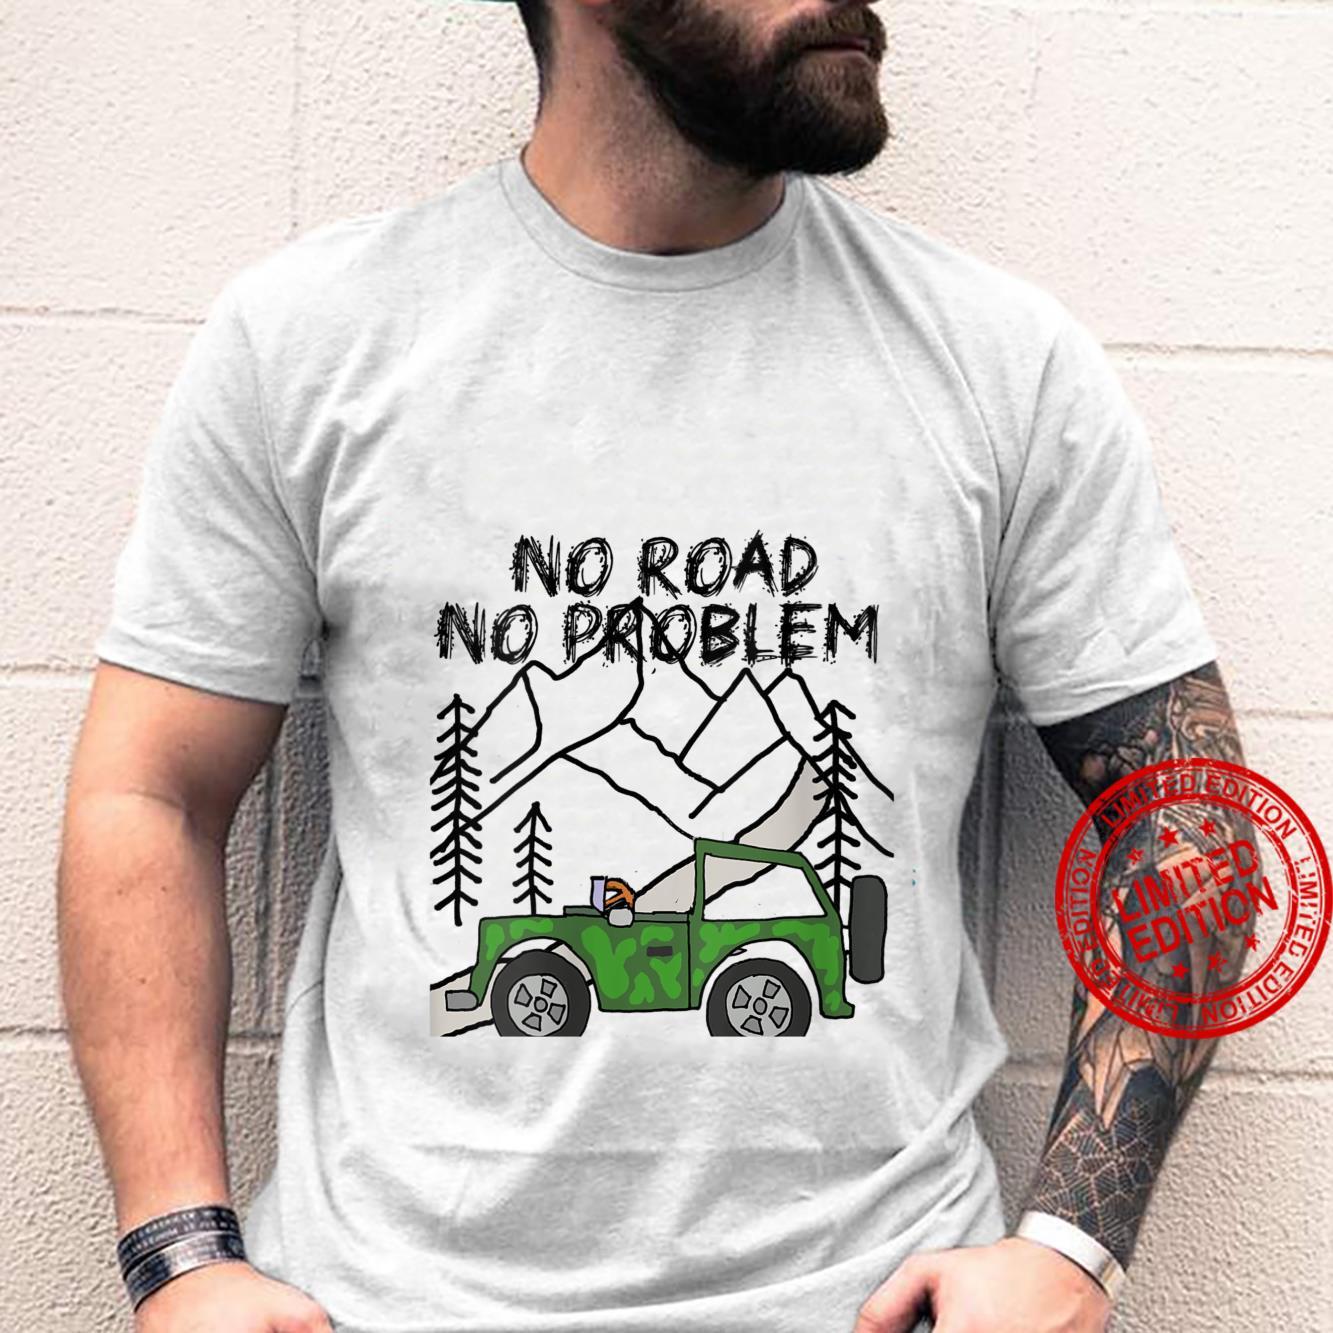 Womens Smileteeshobby OffRoad Vehicle No Road No Problem Shirt